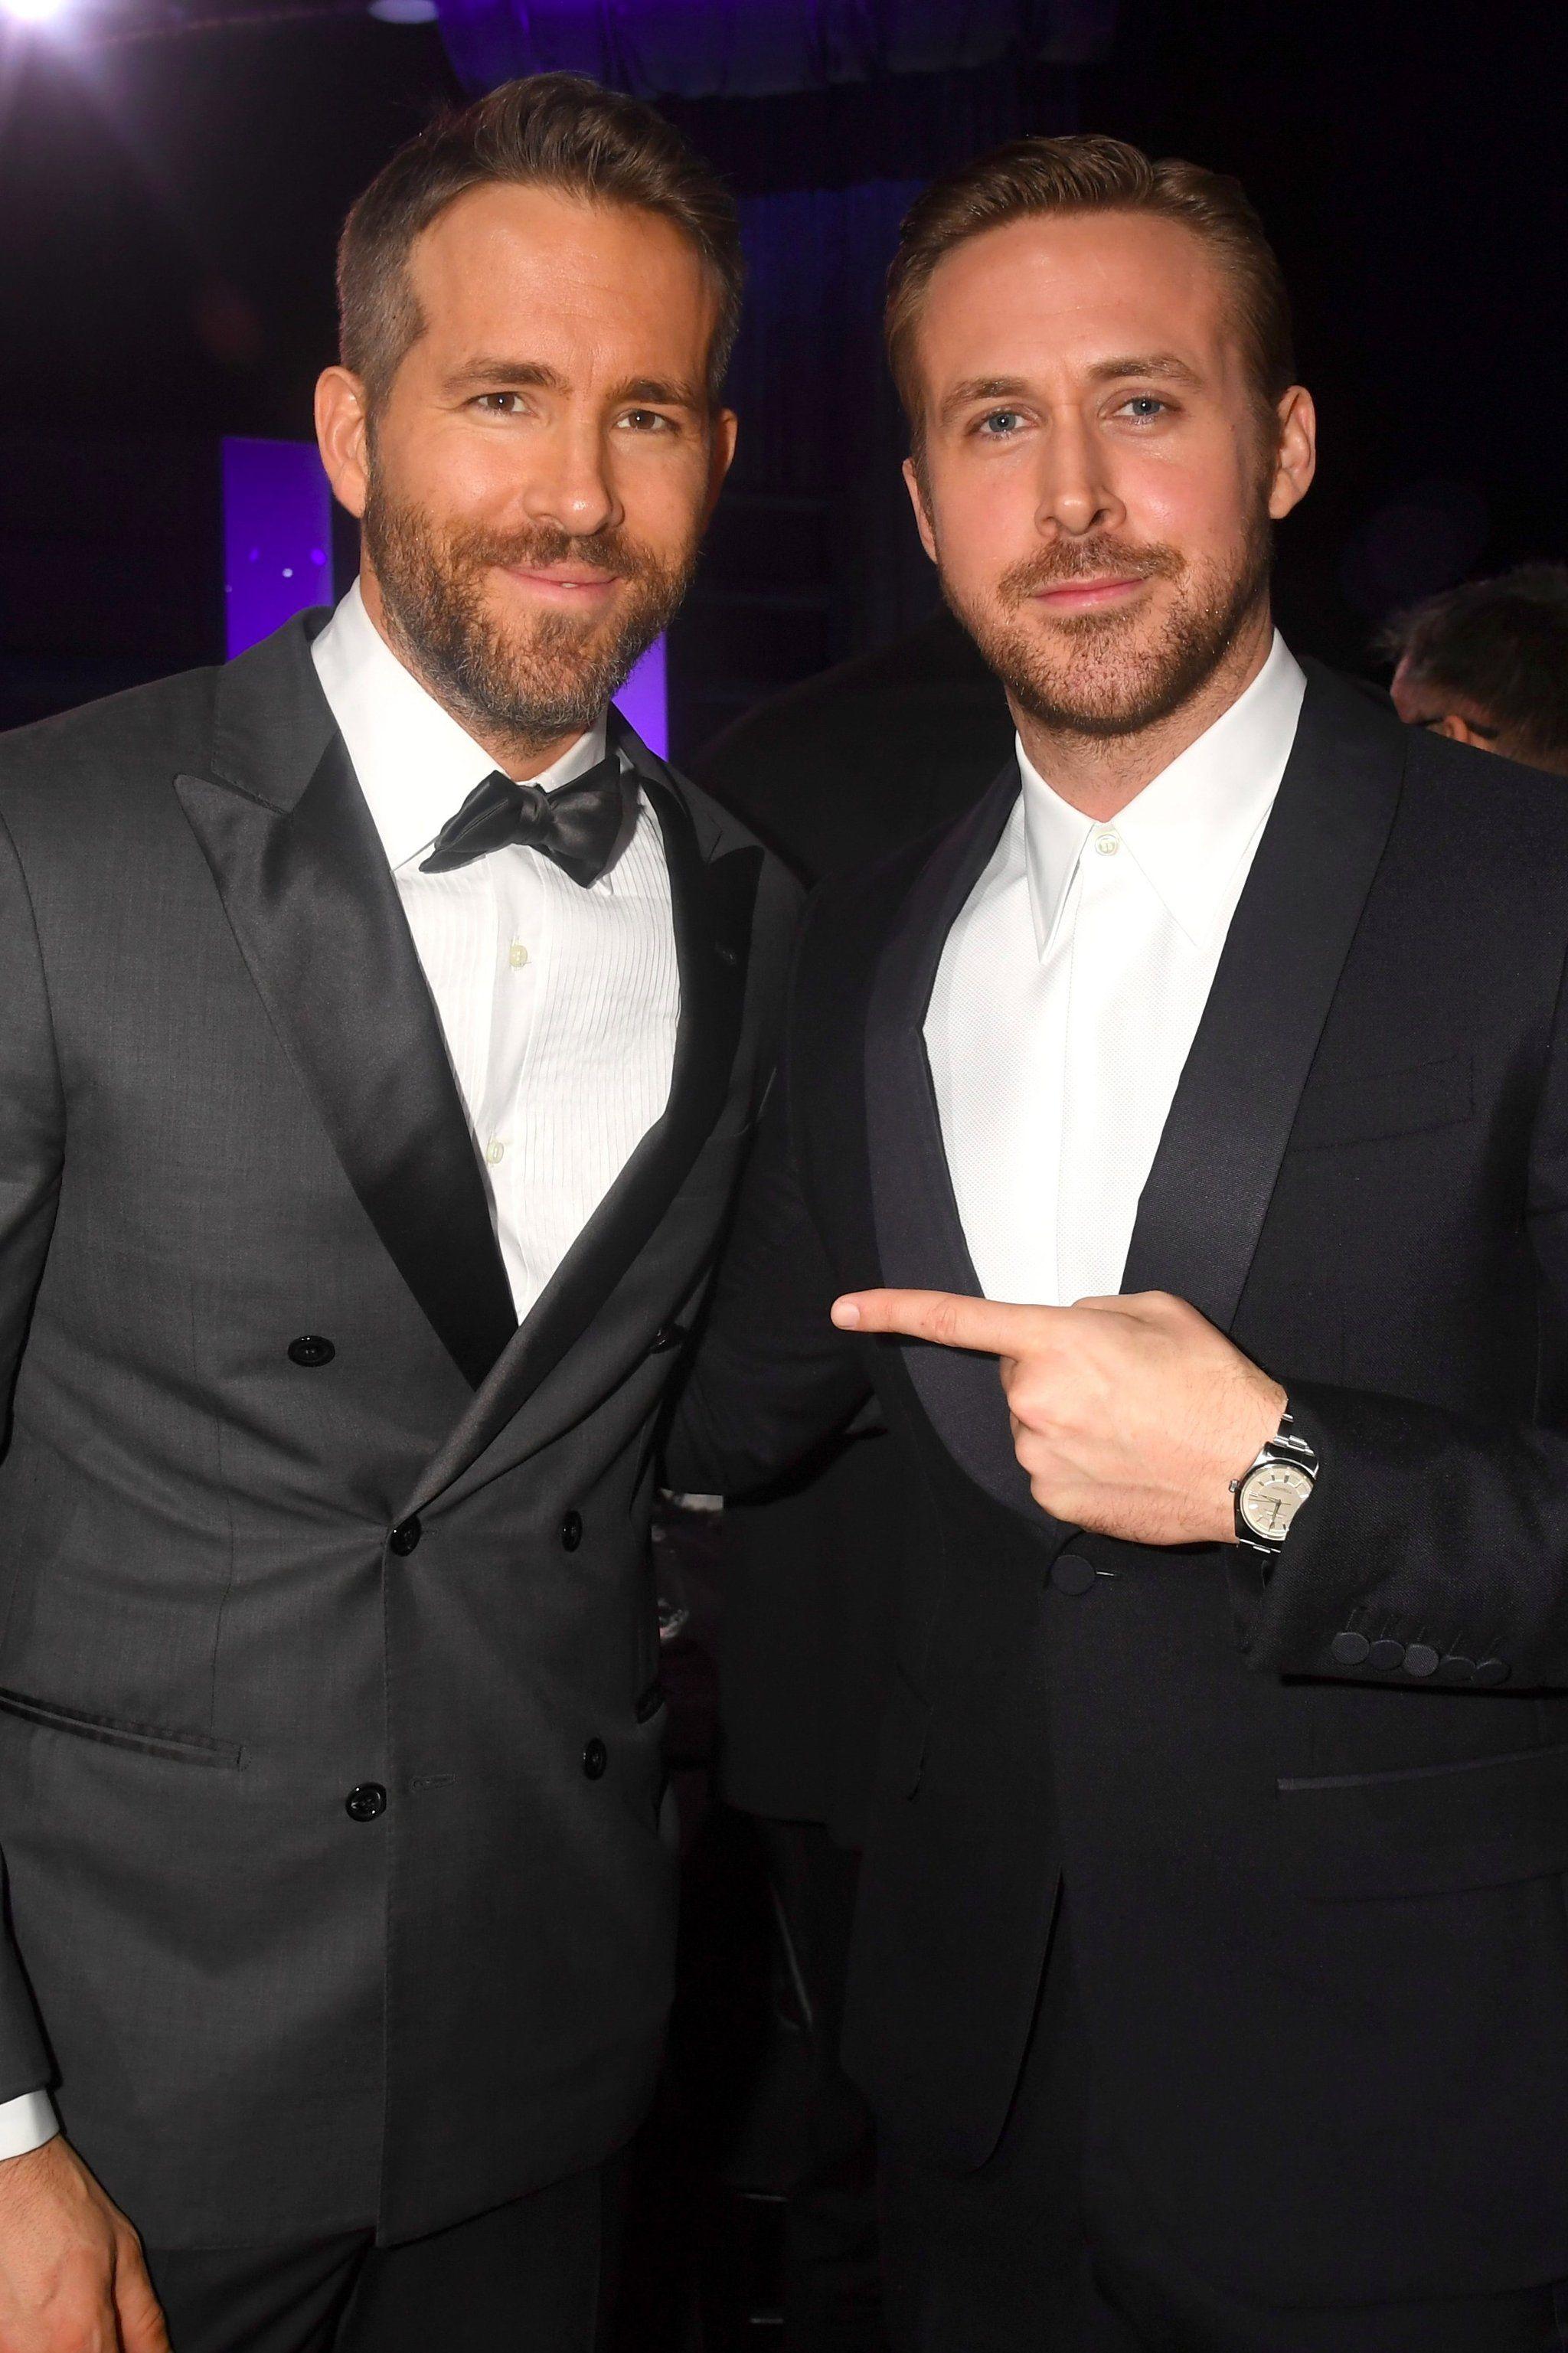 Ryan Reynolds and Ryan Gosling Hug and Stare Into Each